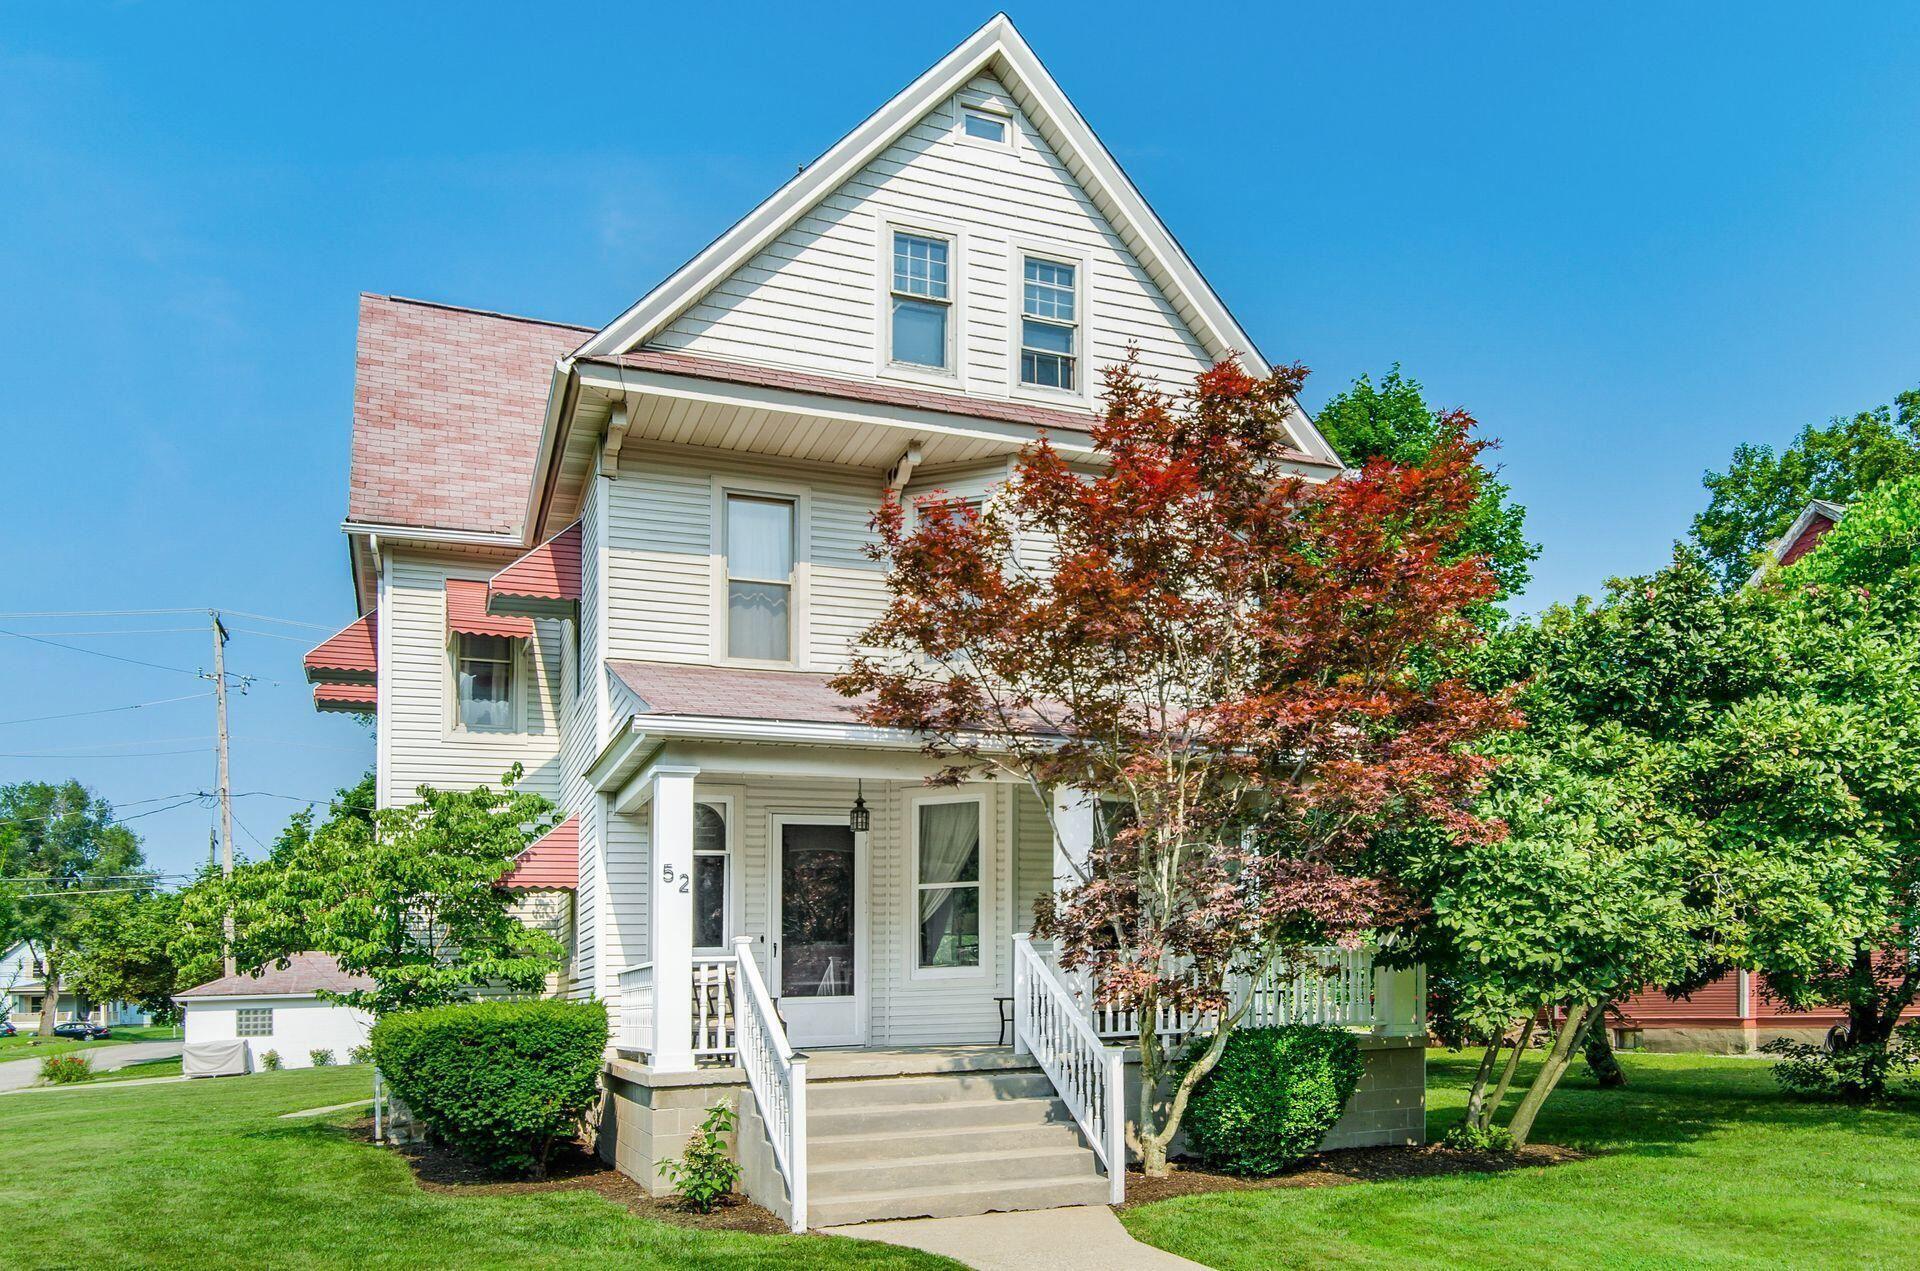 Photo of 52 Montrose Avenue, Delaware, OH 43015 (MLS # 221029034)